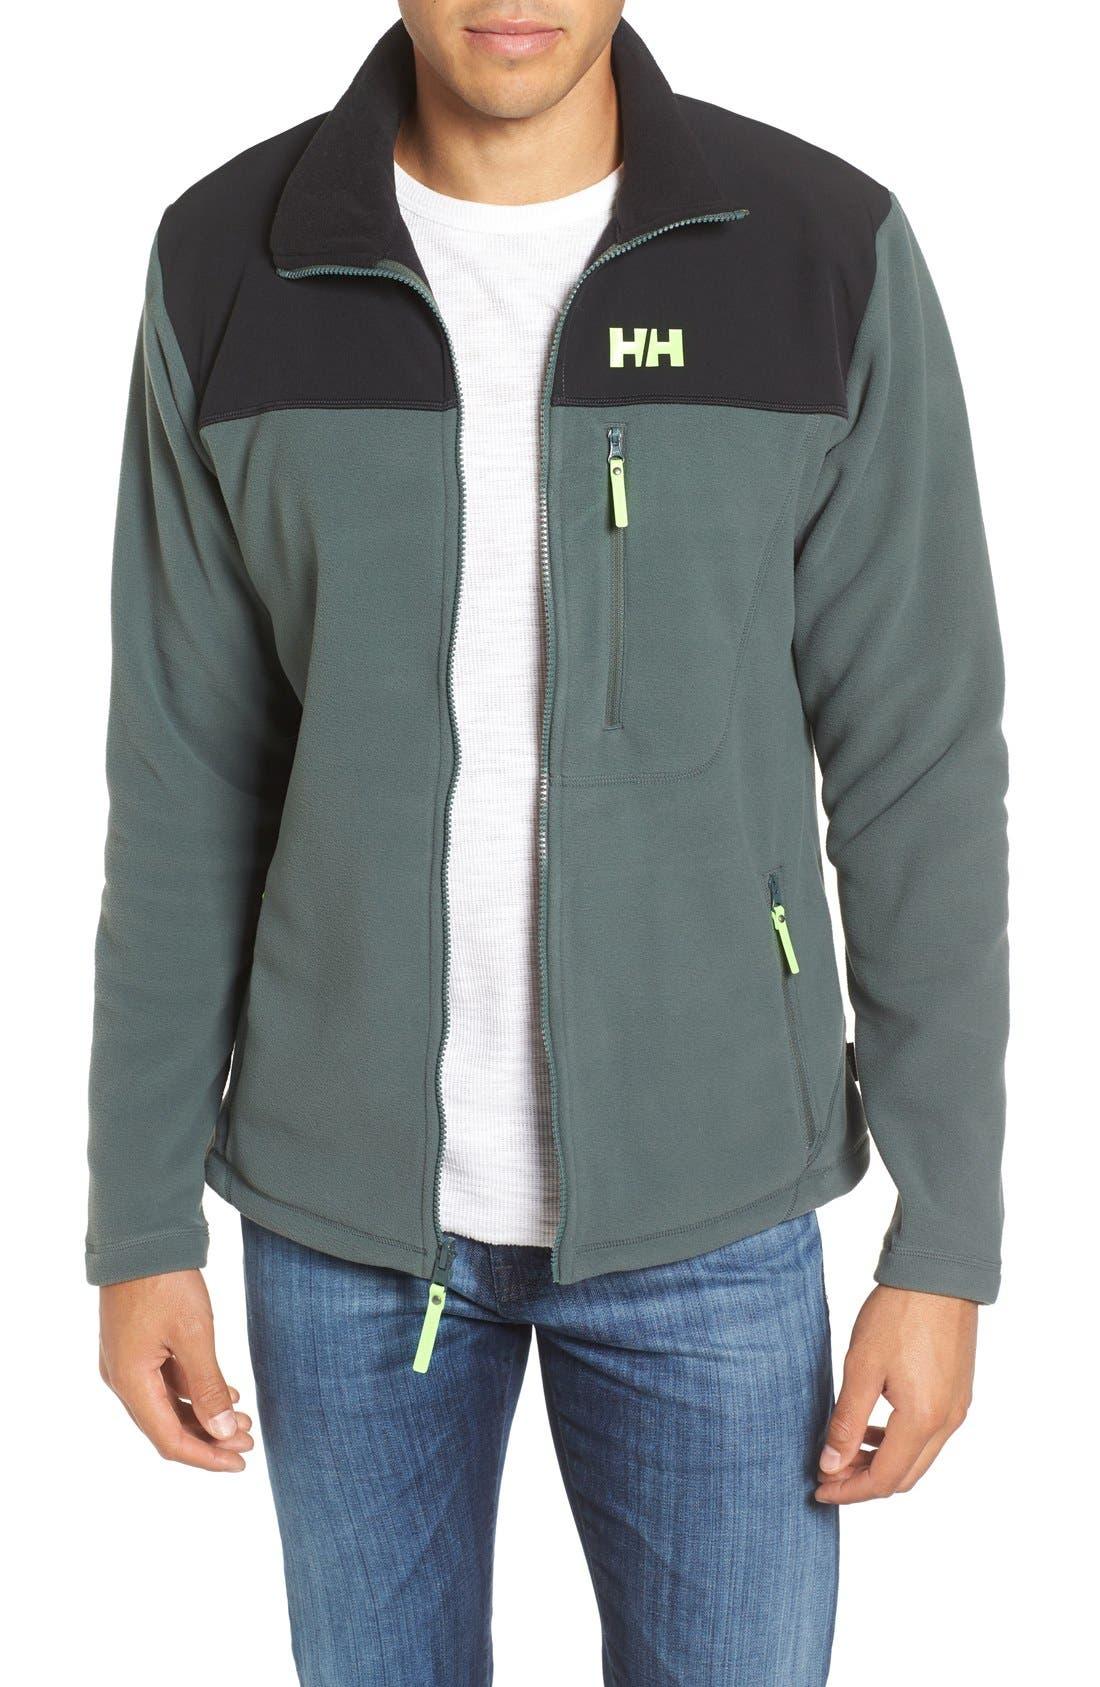 Sitka Fleece Jacket,                         Main,                         color, Rock